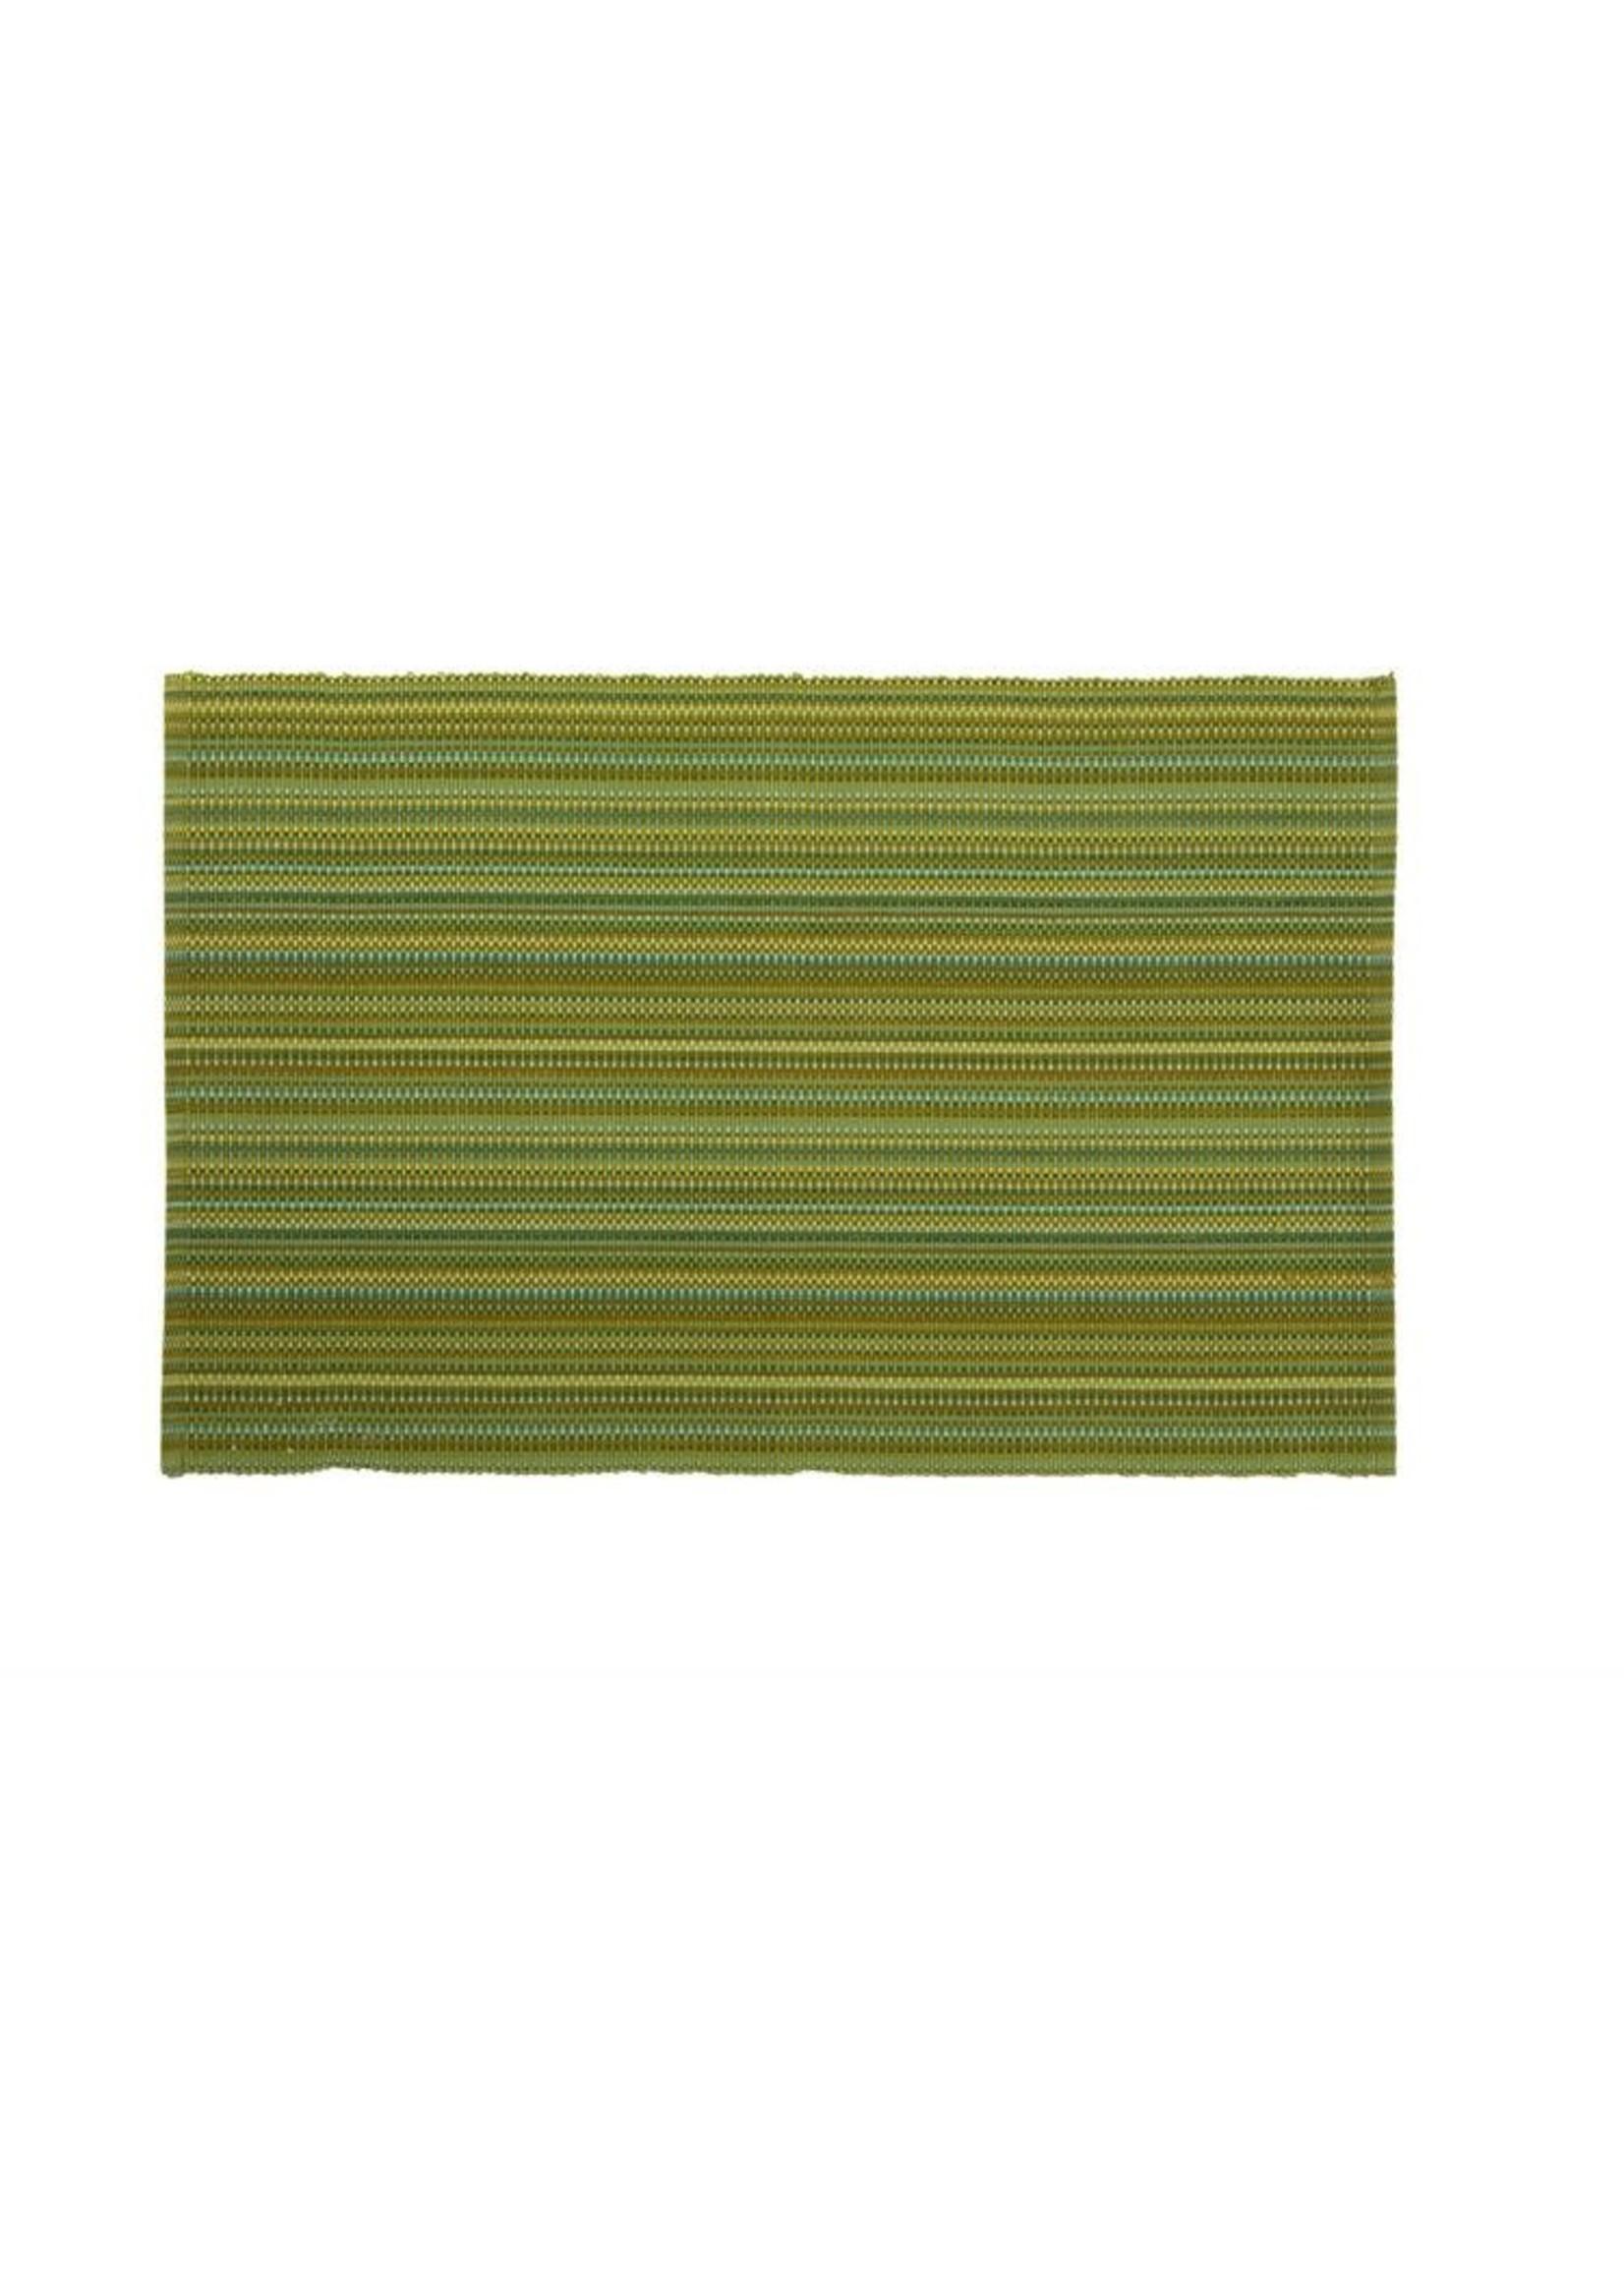 GREEN STRIPE PLACEMAT